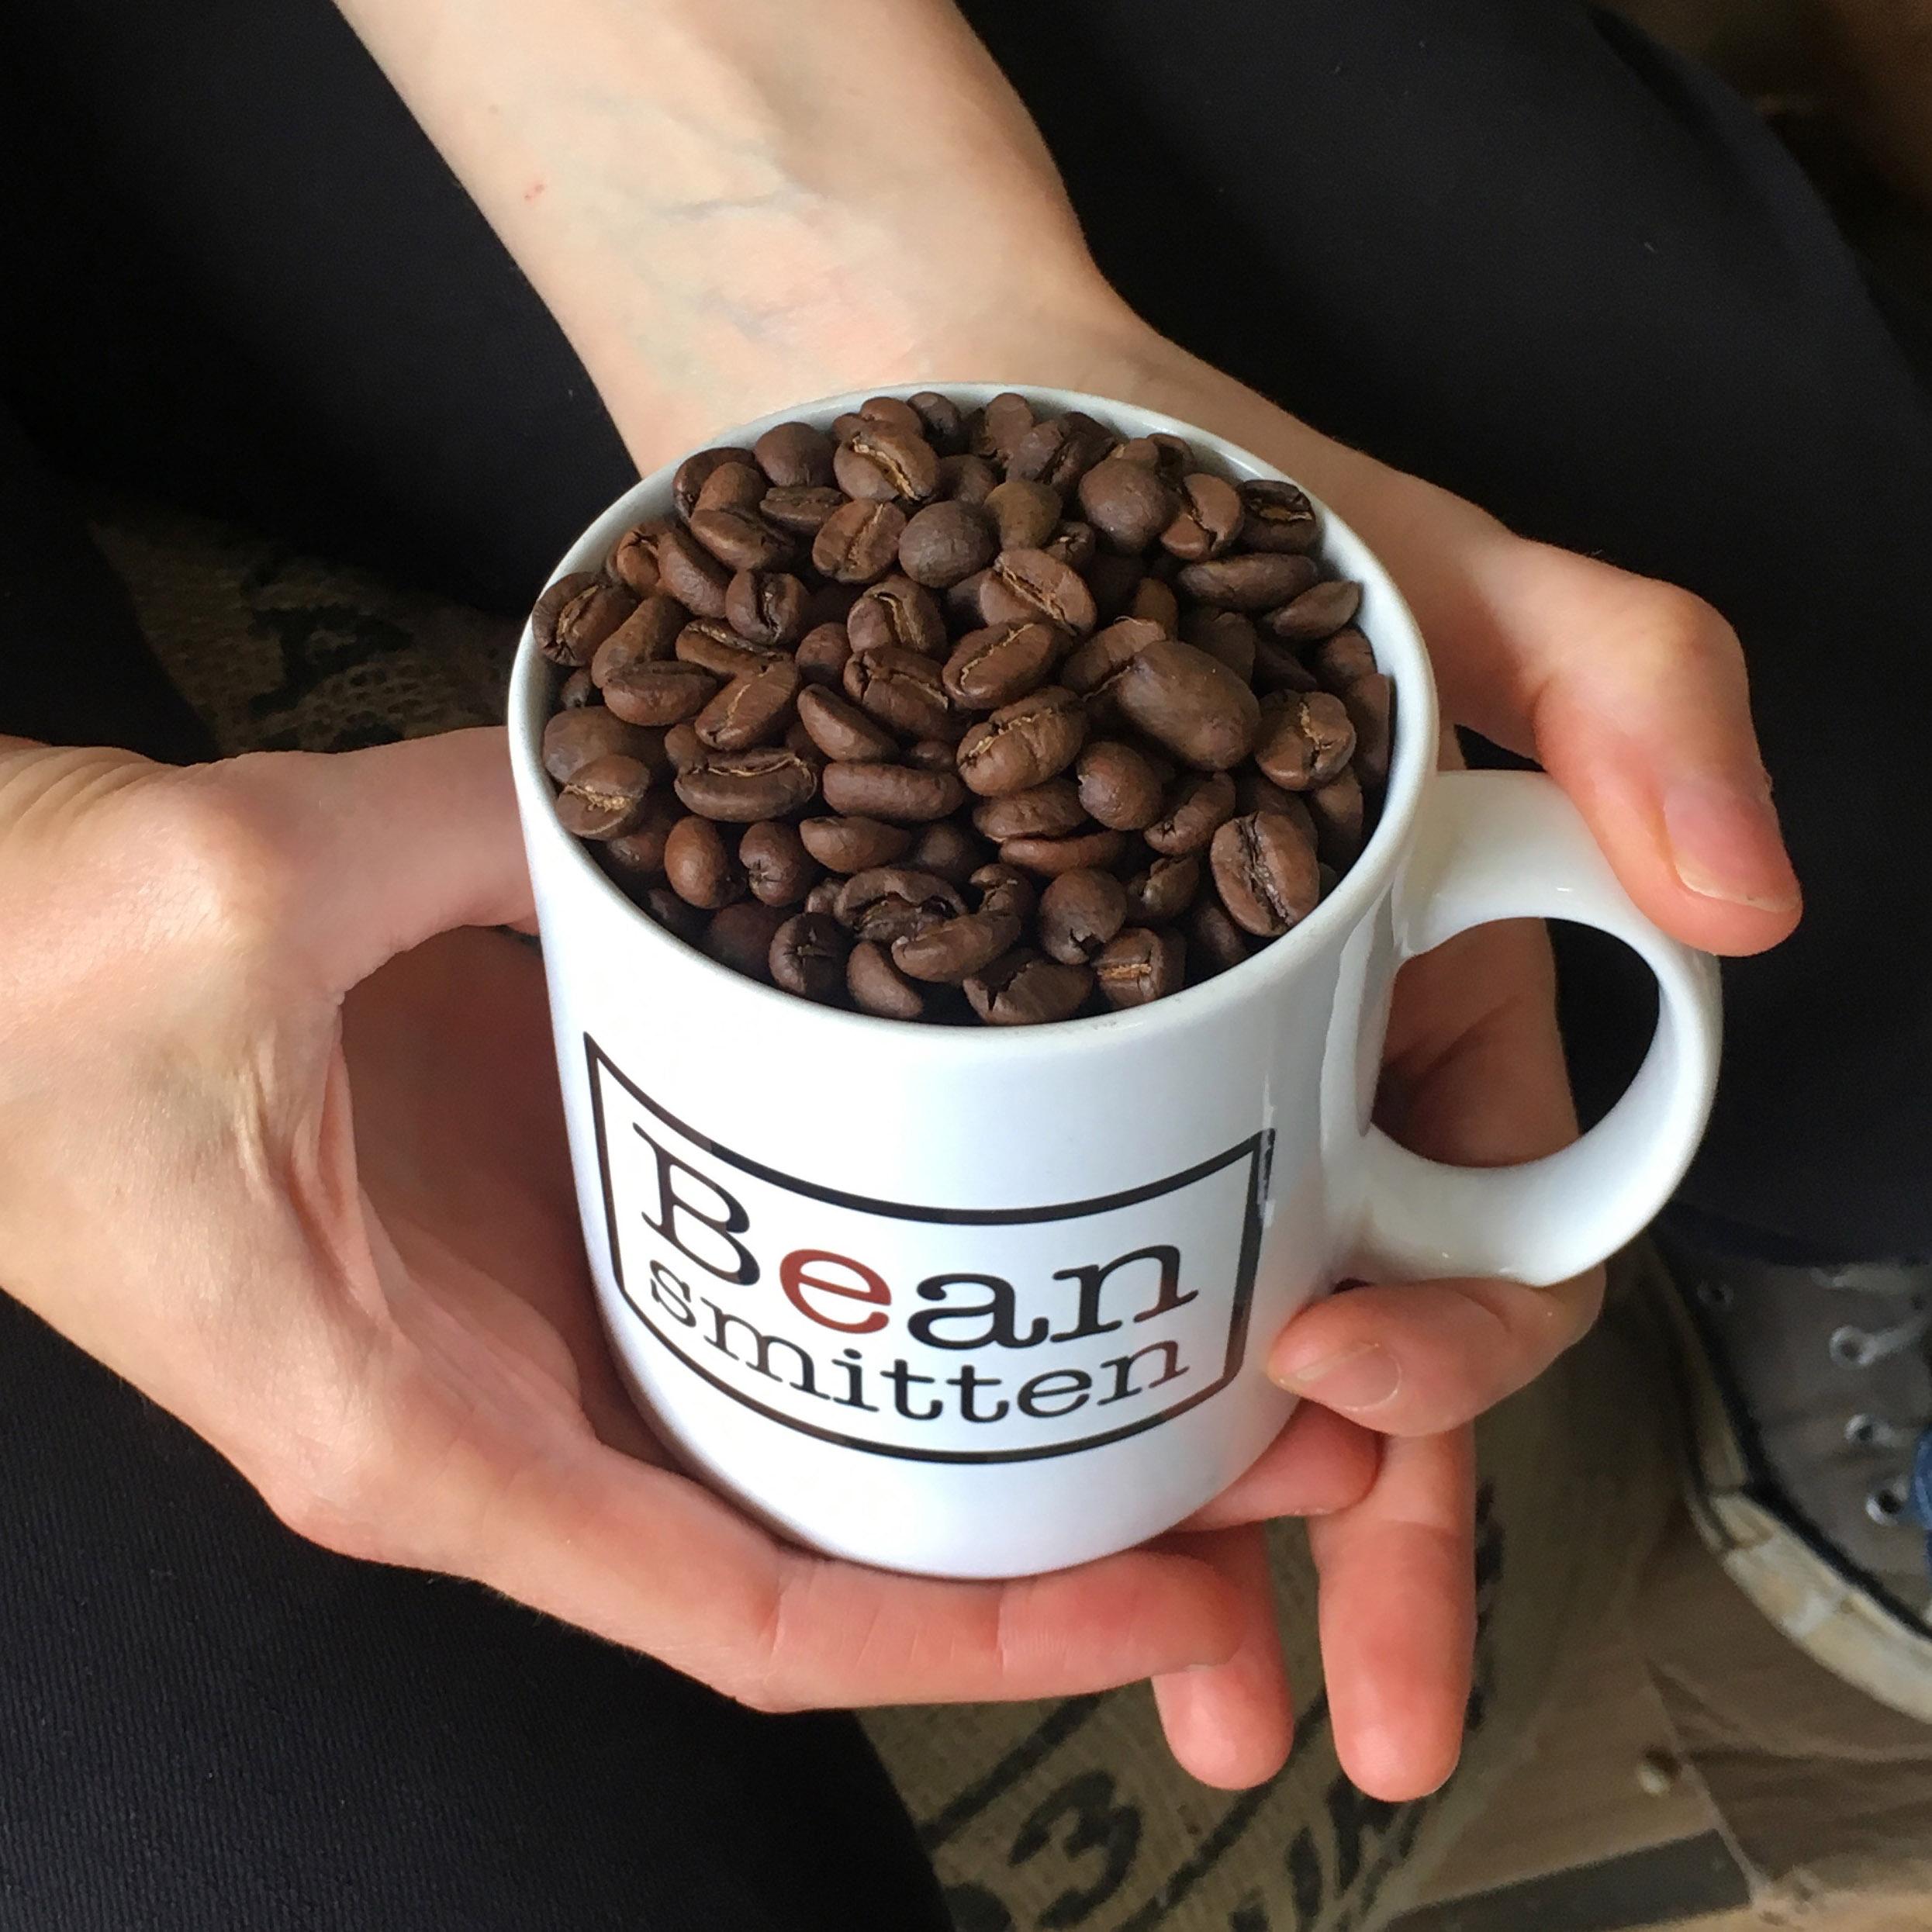 Bean Smitten OTW Coffee Beans